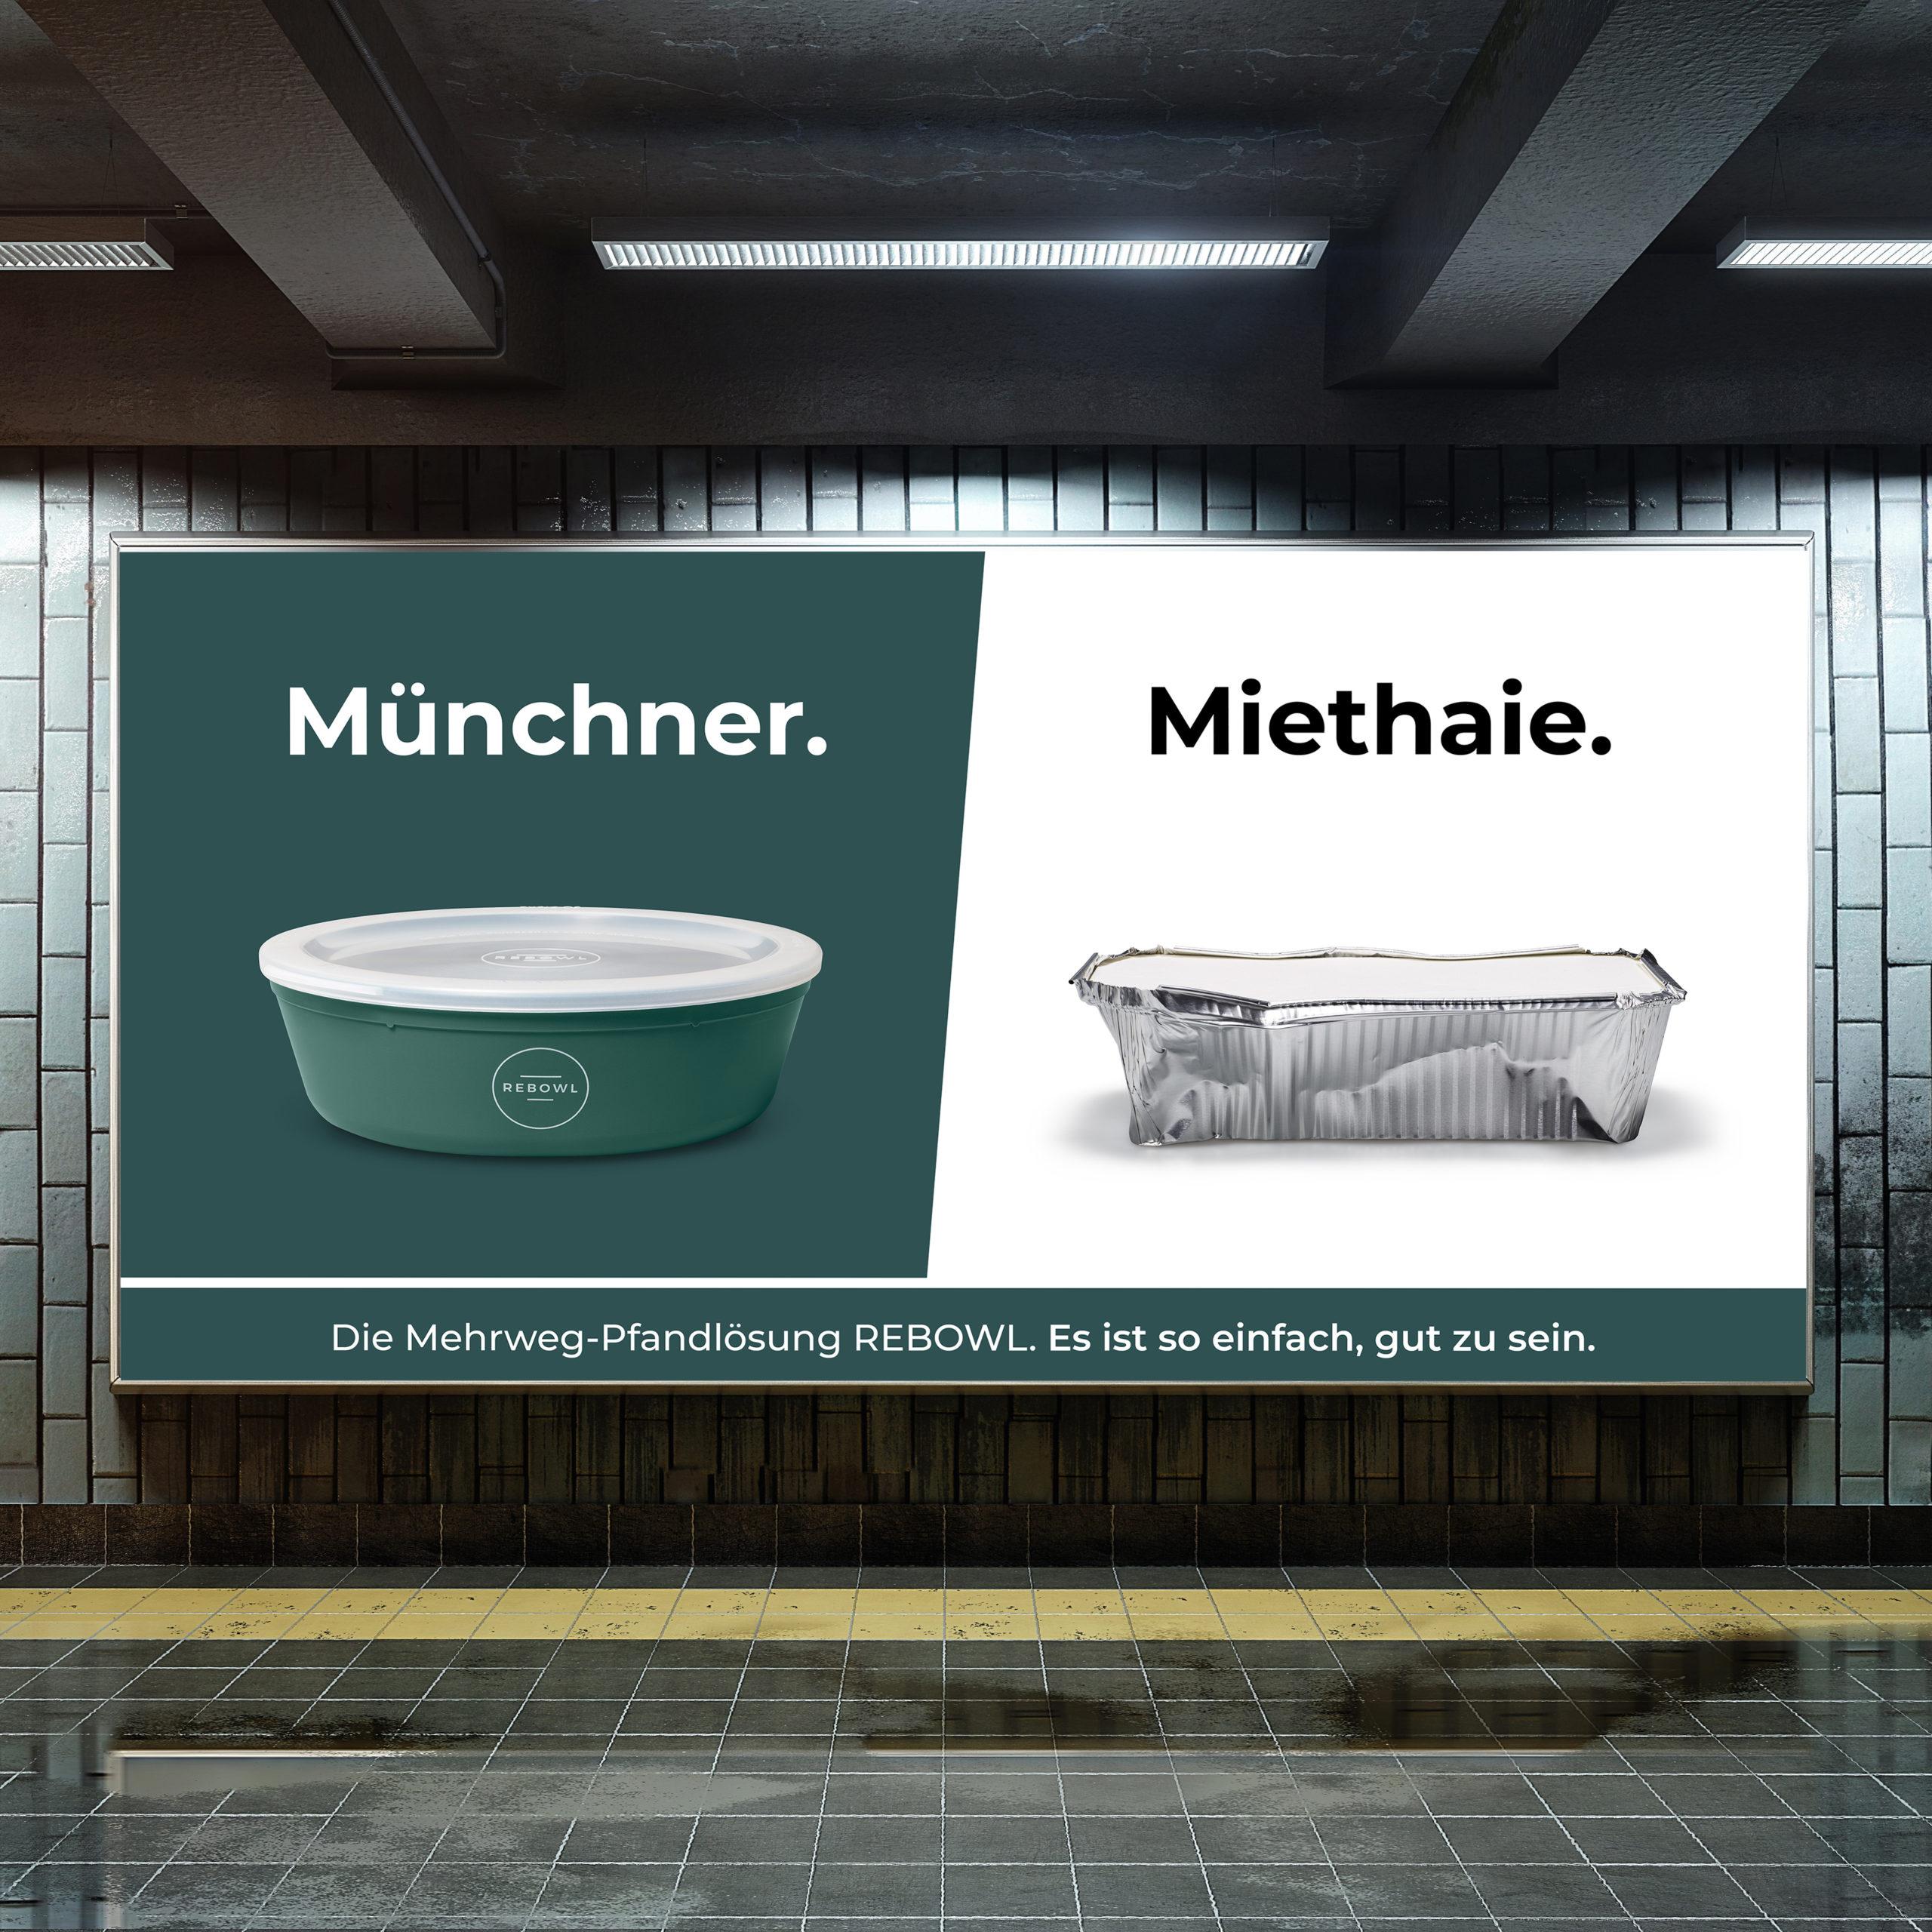 Big,Horizontal,Poster,On,Metro,Station